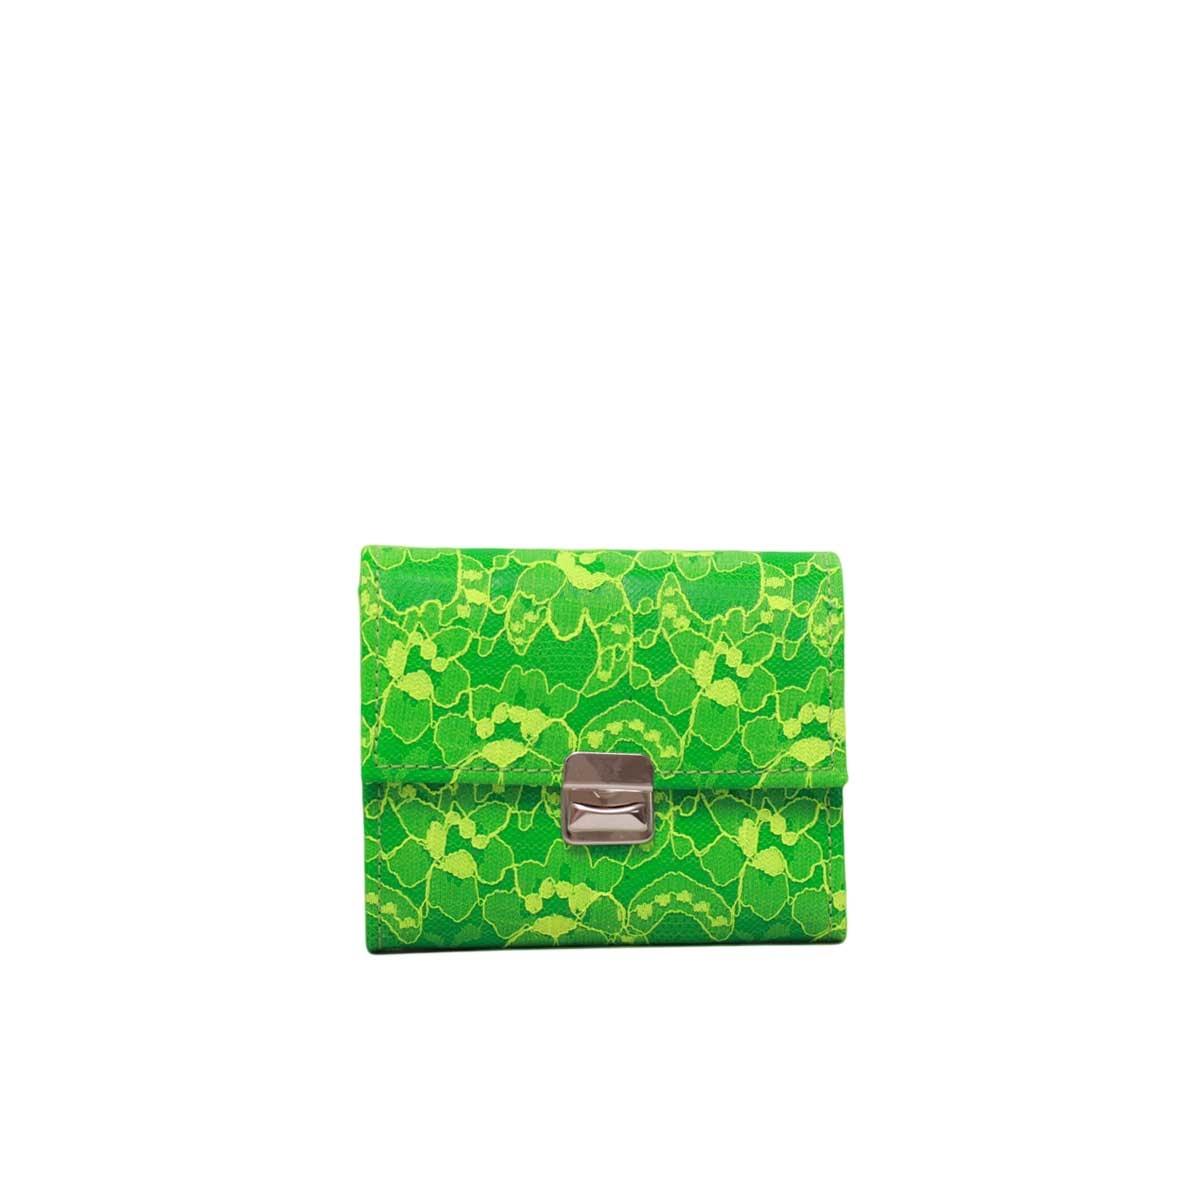 damen geldbörse neon grün